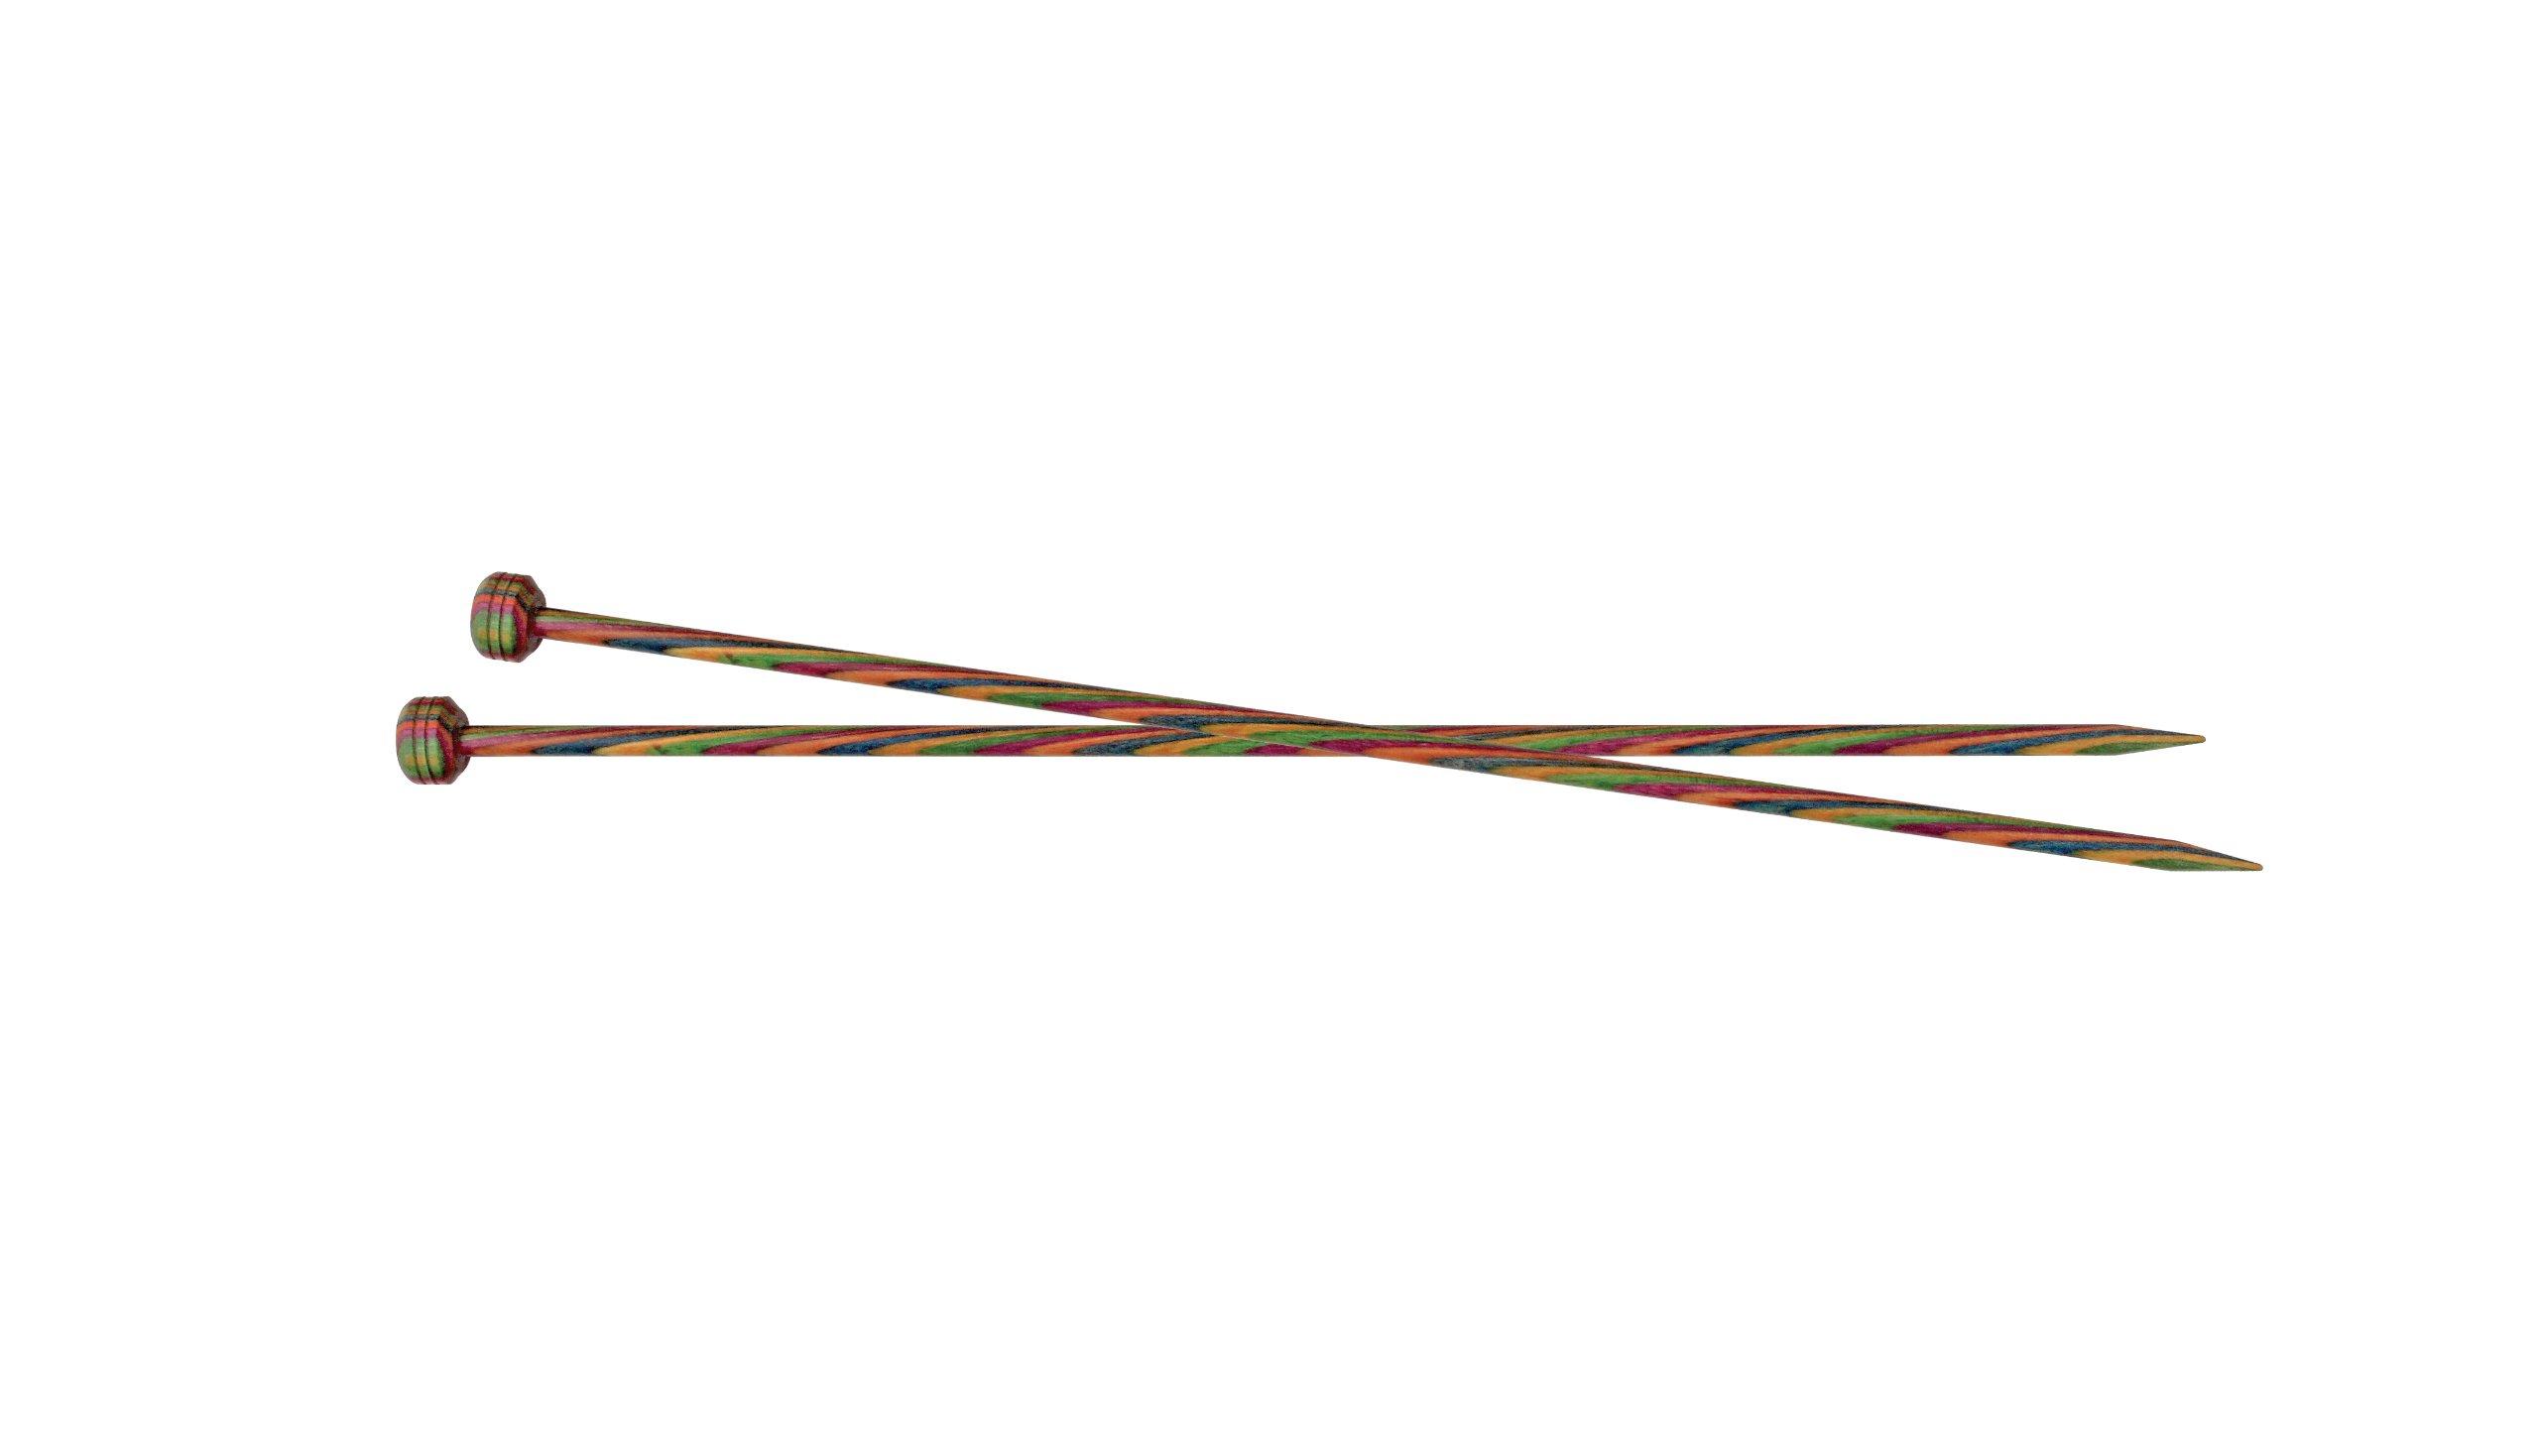 KnitPro 40 cm x 5 mm Symfonie Single Pointed Needles, Multi-Color